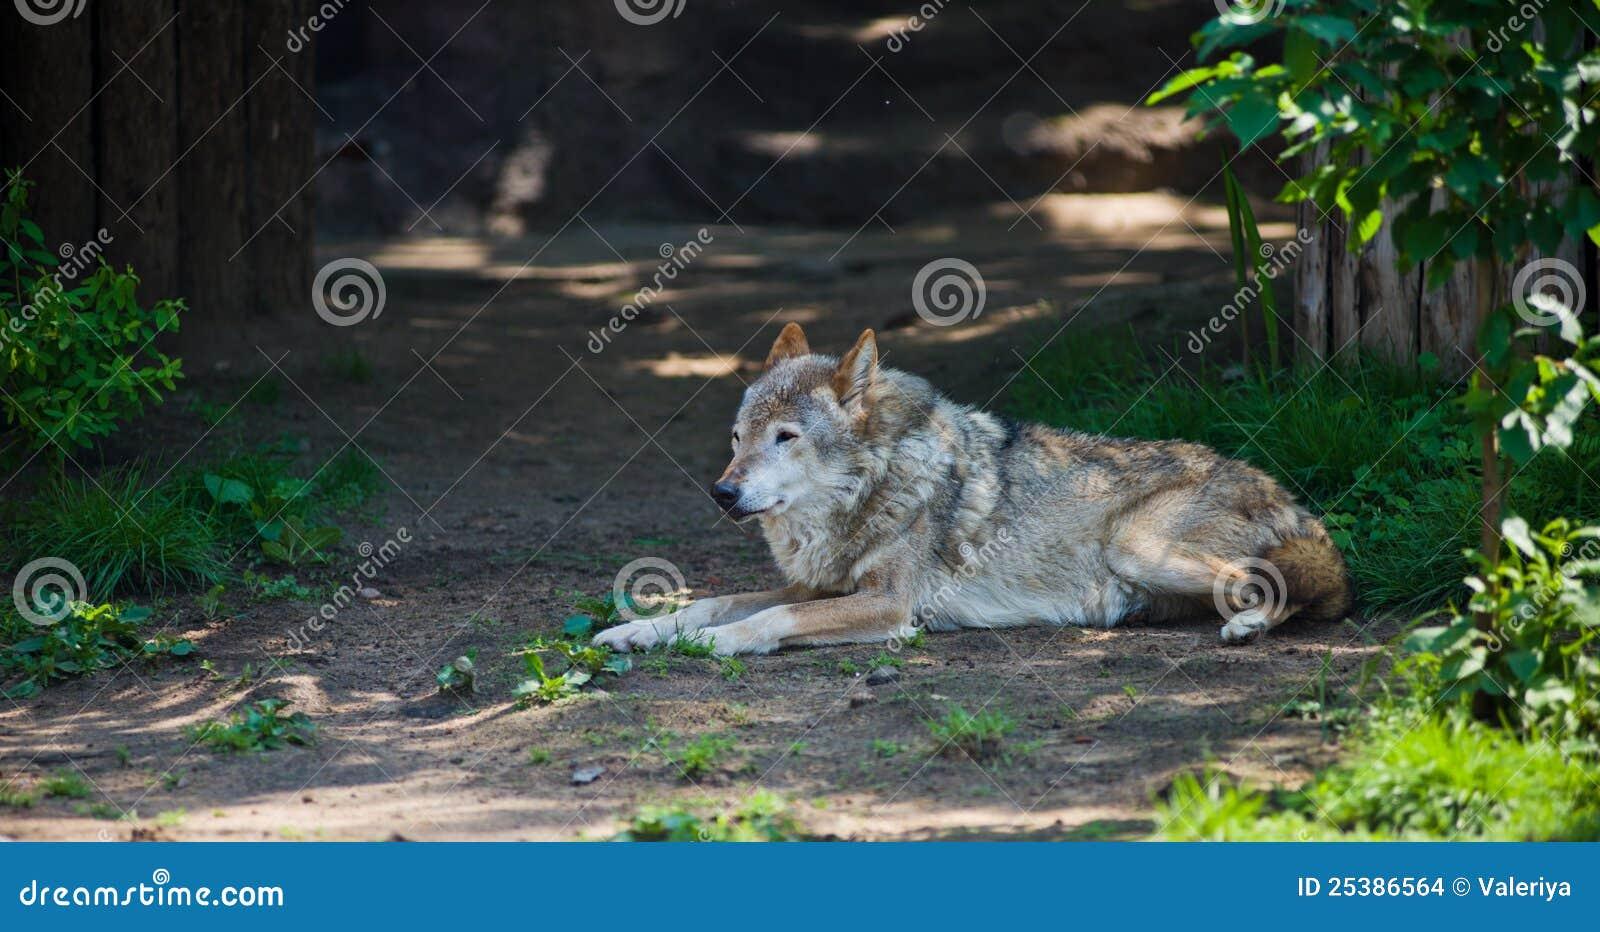 Wolf Lying Stock Images - Image: 25386564  Wolf Lying Stoc...